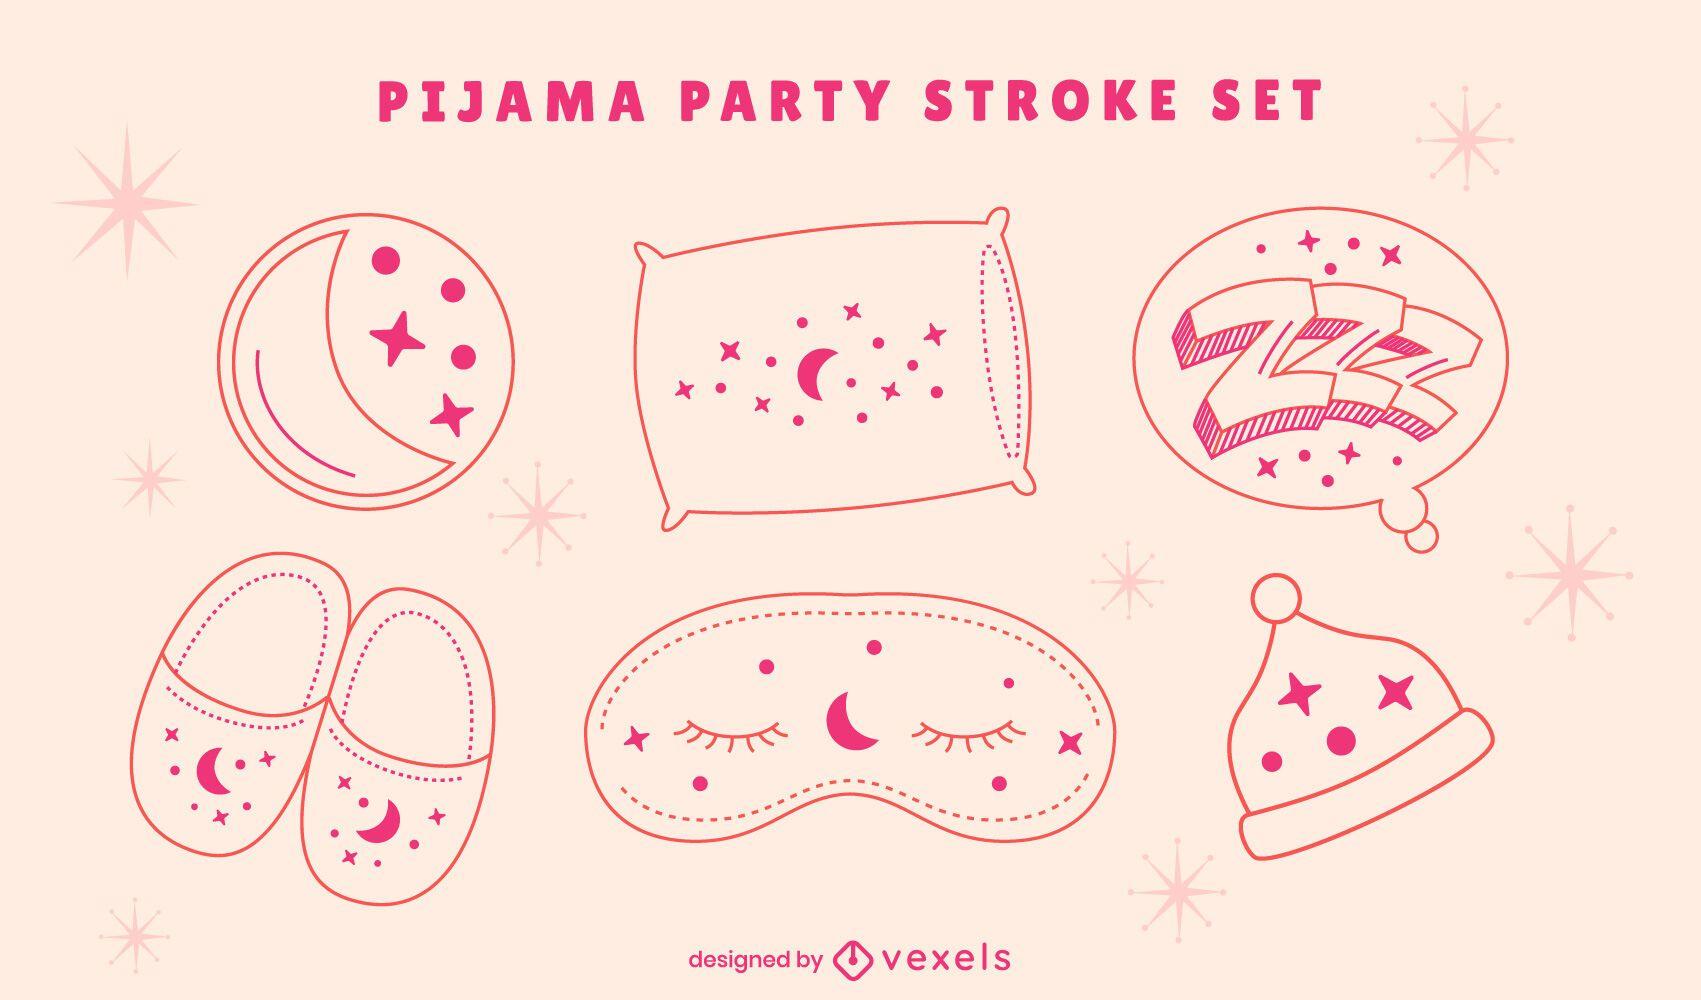 Sleepover pajama party line art set